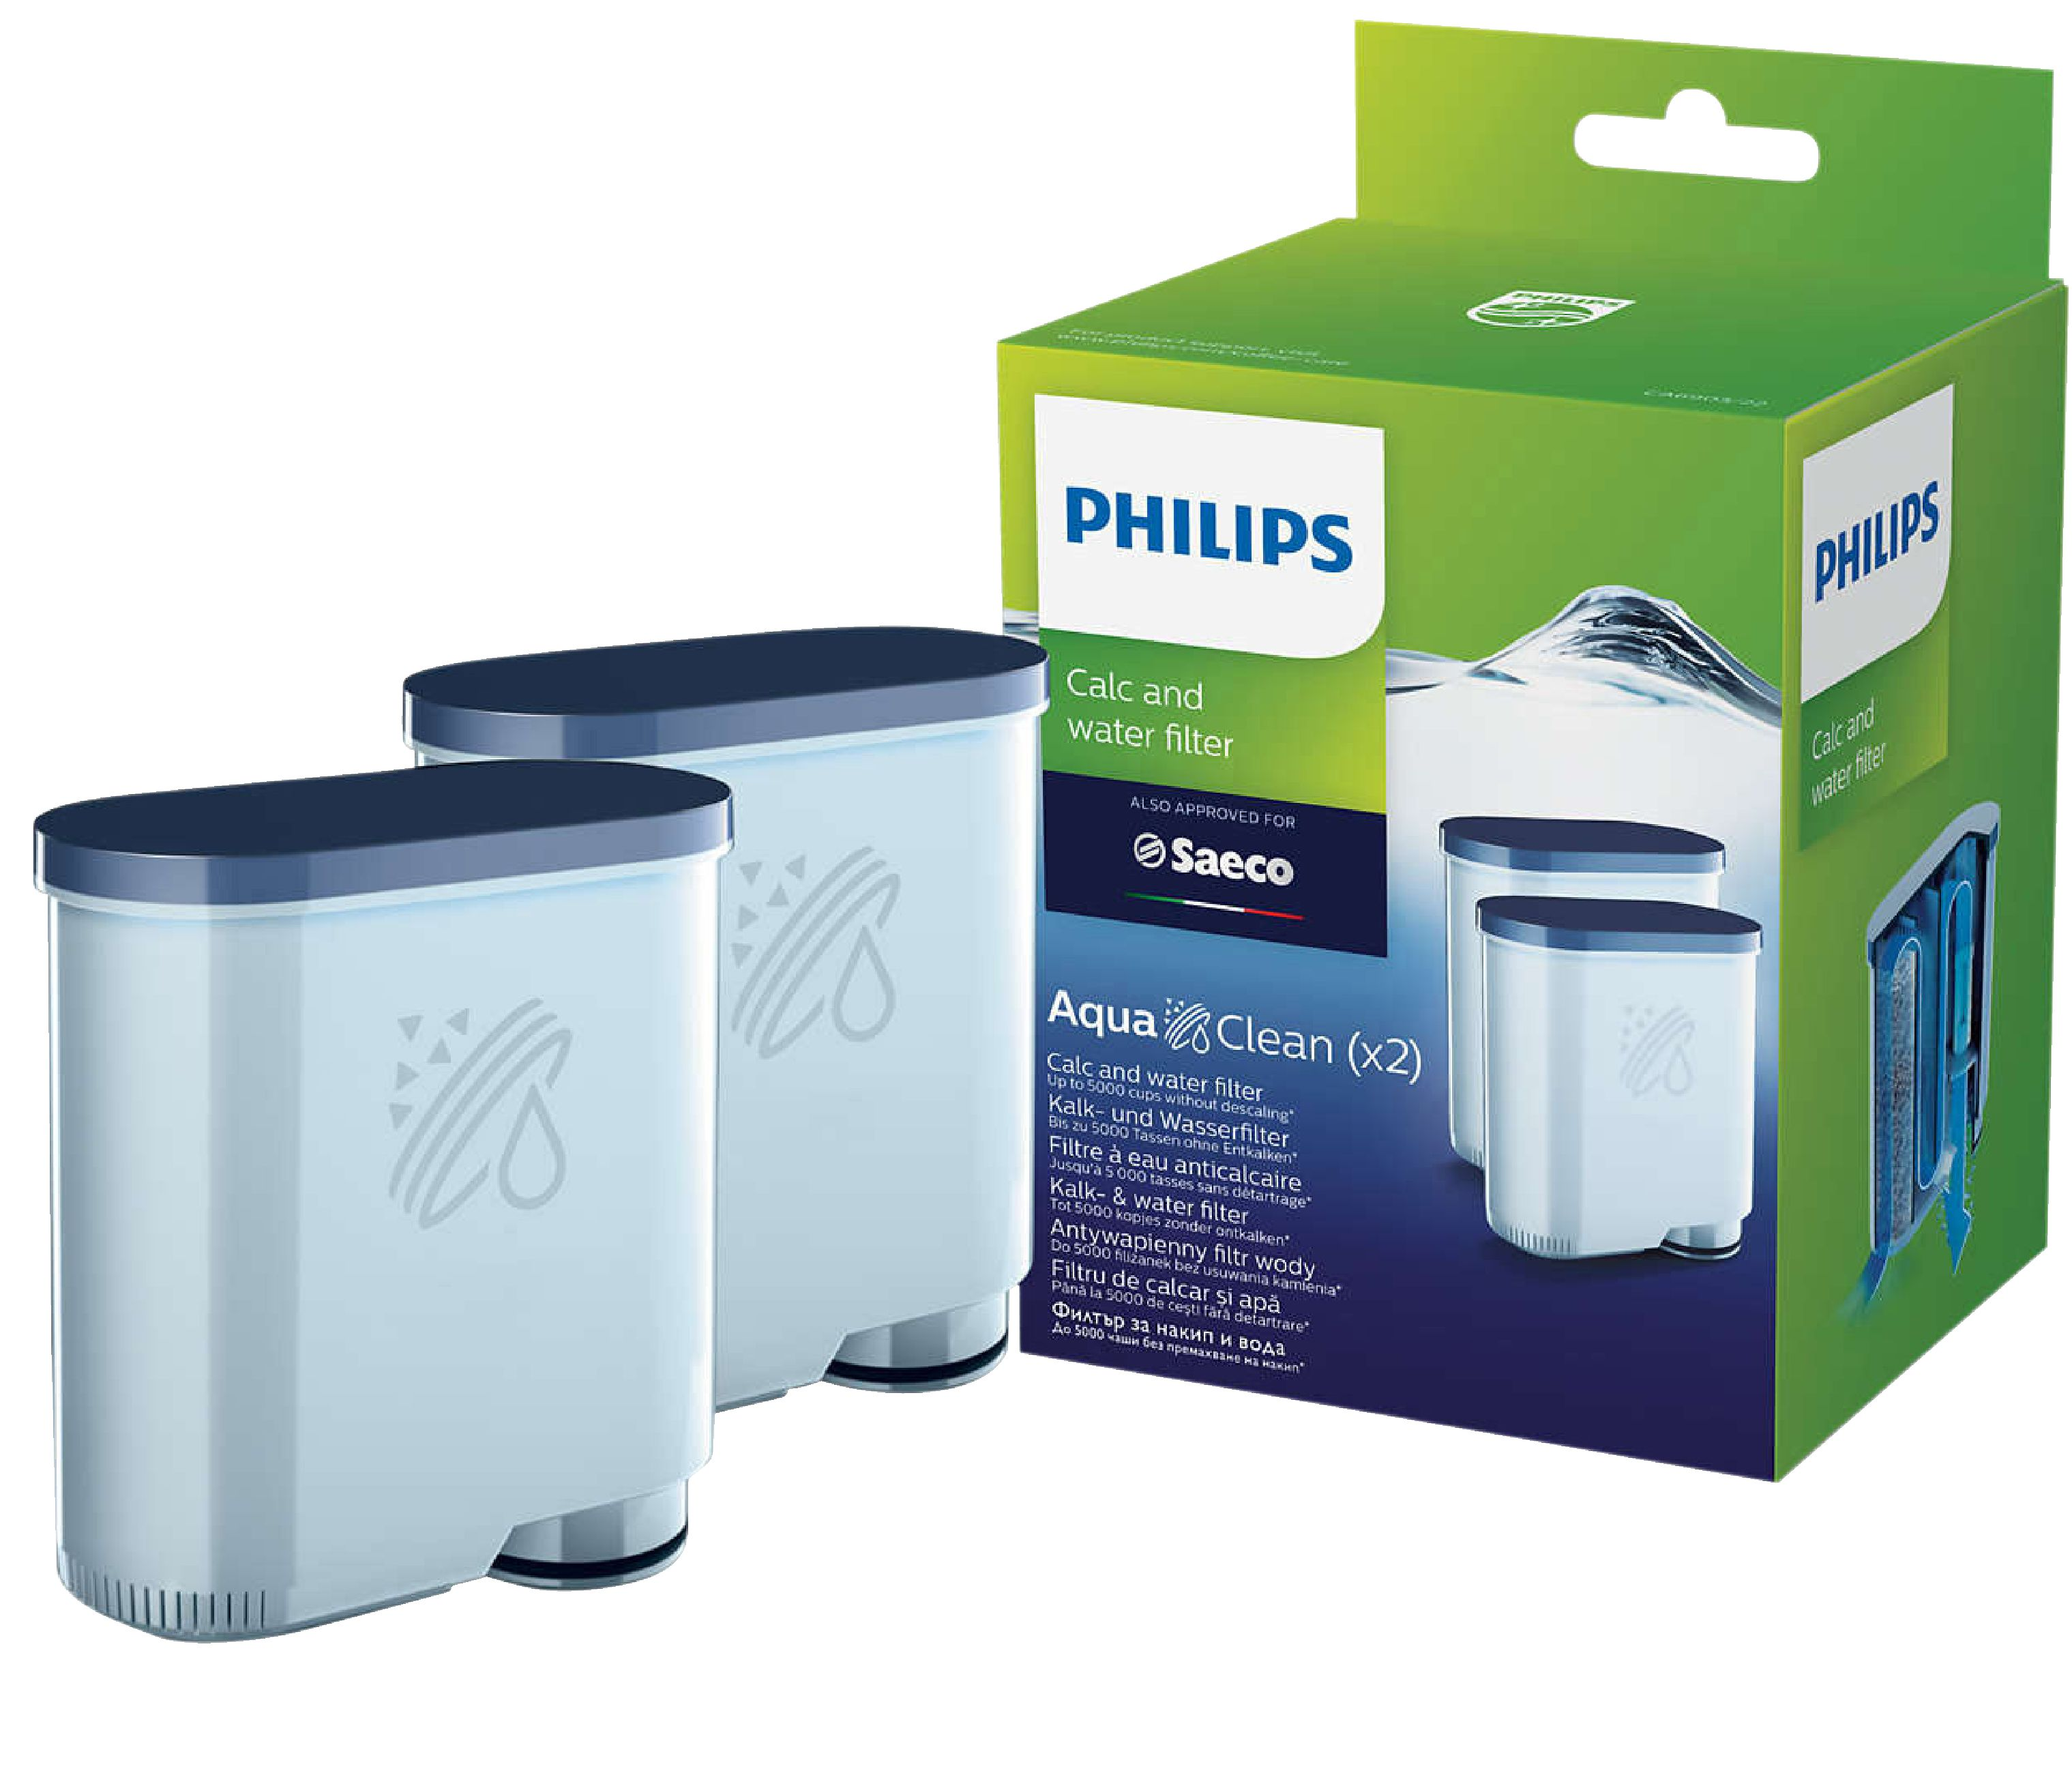 Vodní filtr Philips pro Saeco Espresso CA6903/22 AquaClean 2ks